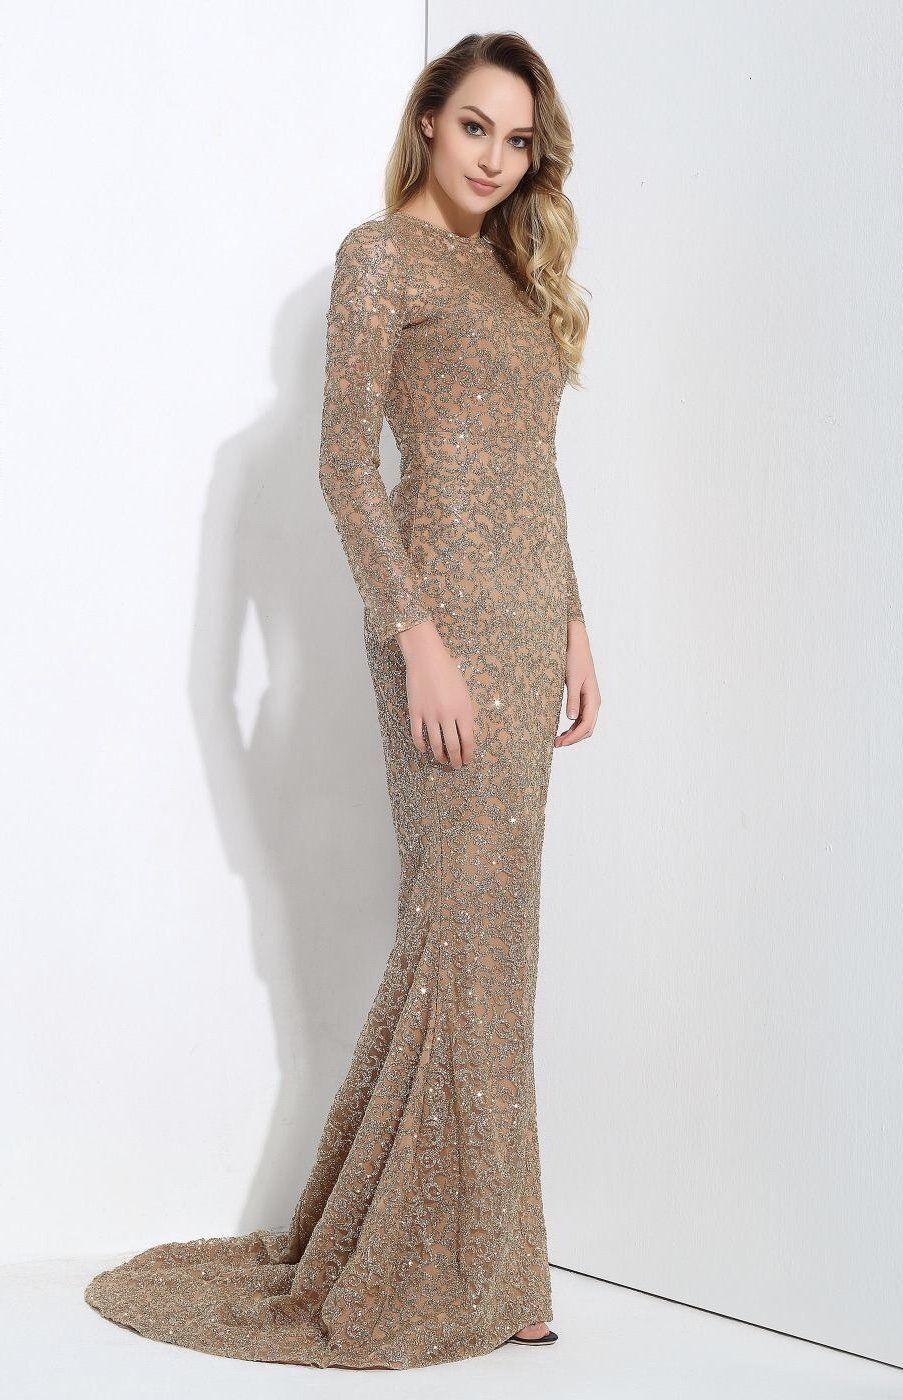 Allure gold glitter embellished long sleeve fishtail maxi dress